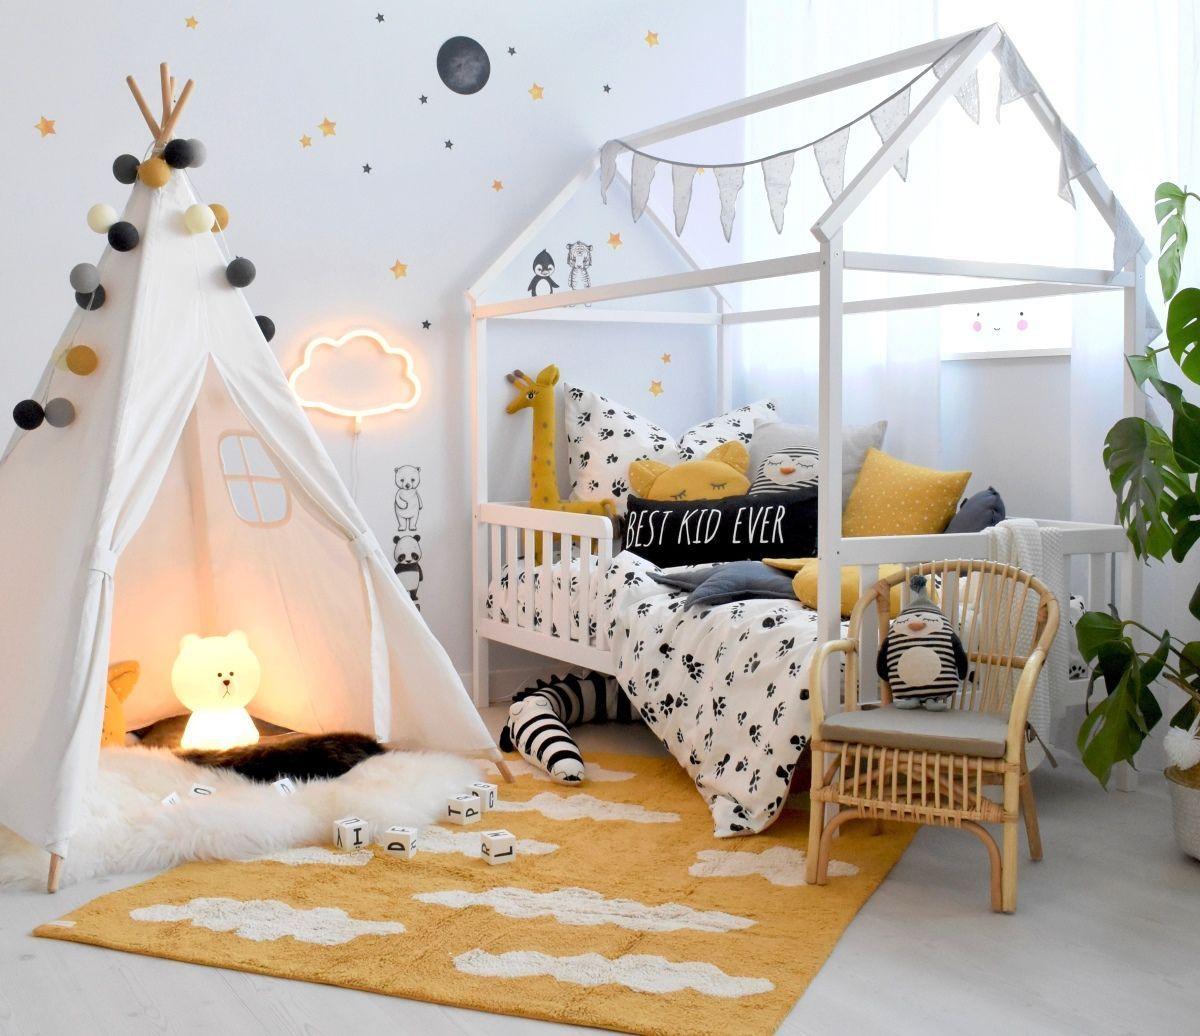 Buy modern children's room with house bed online at Fantasyroom - my blog#bed #blog #buy #childrens #fantasyroom #house #modern #online #room